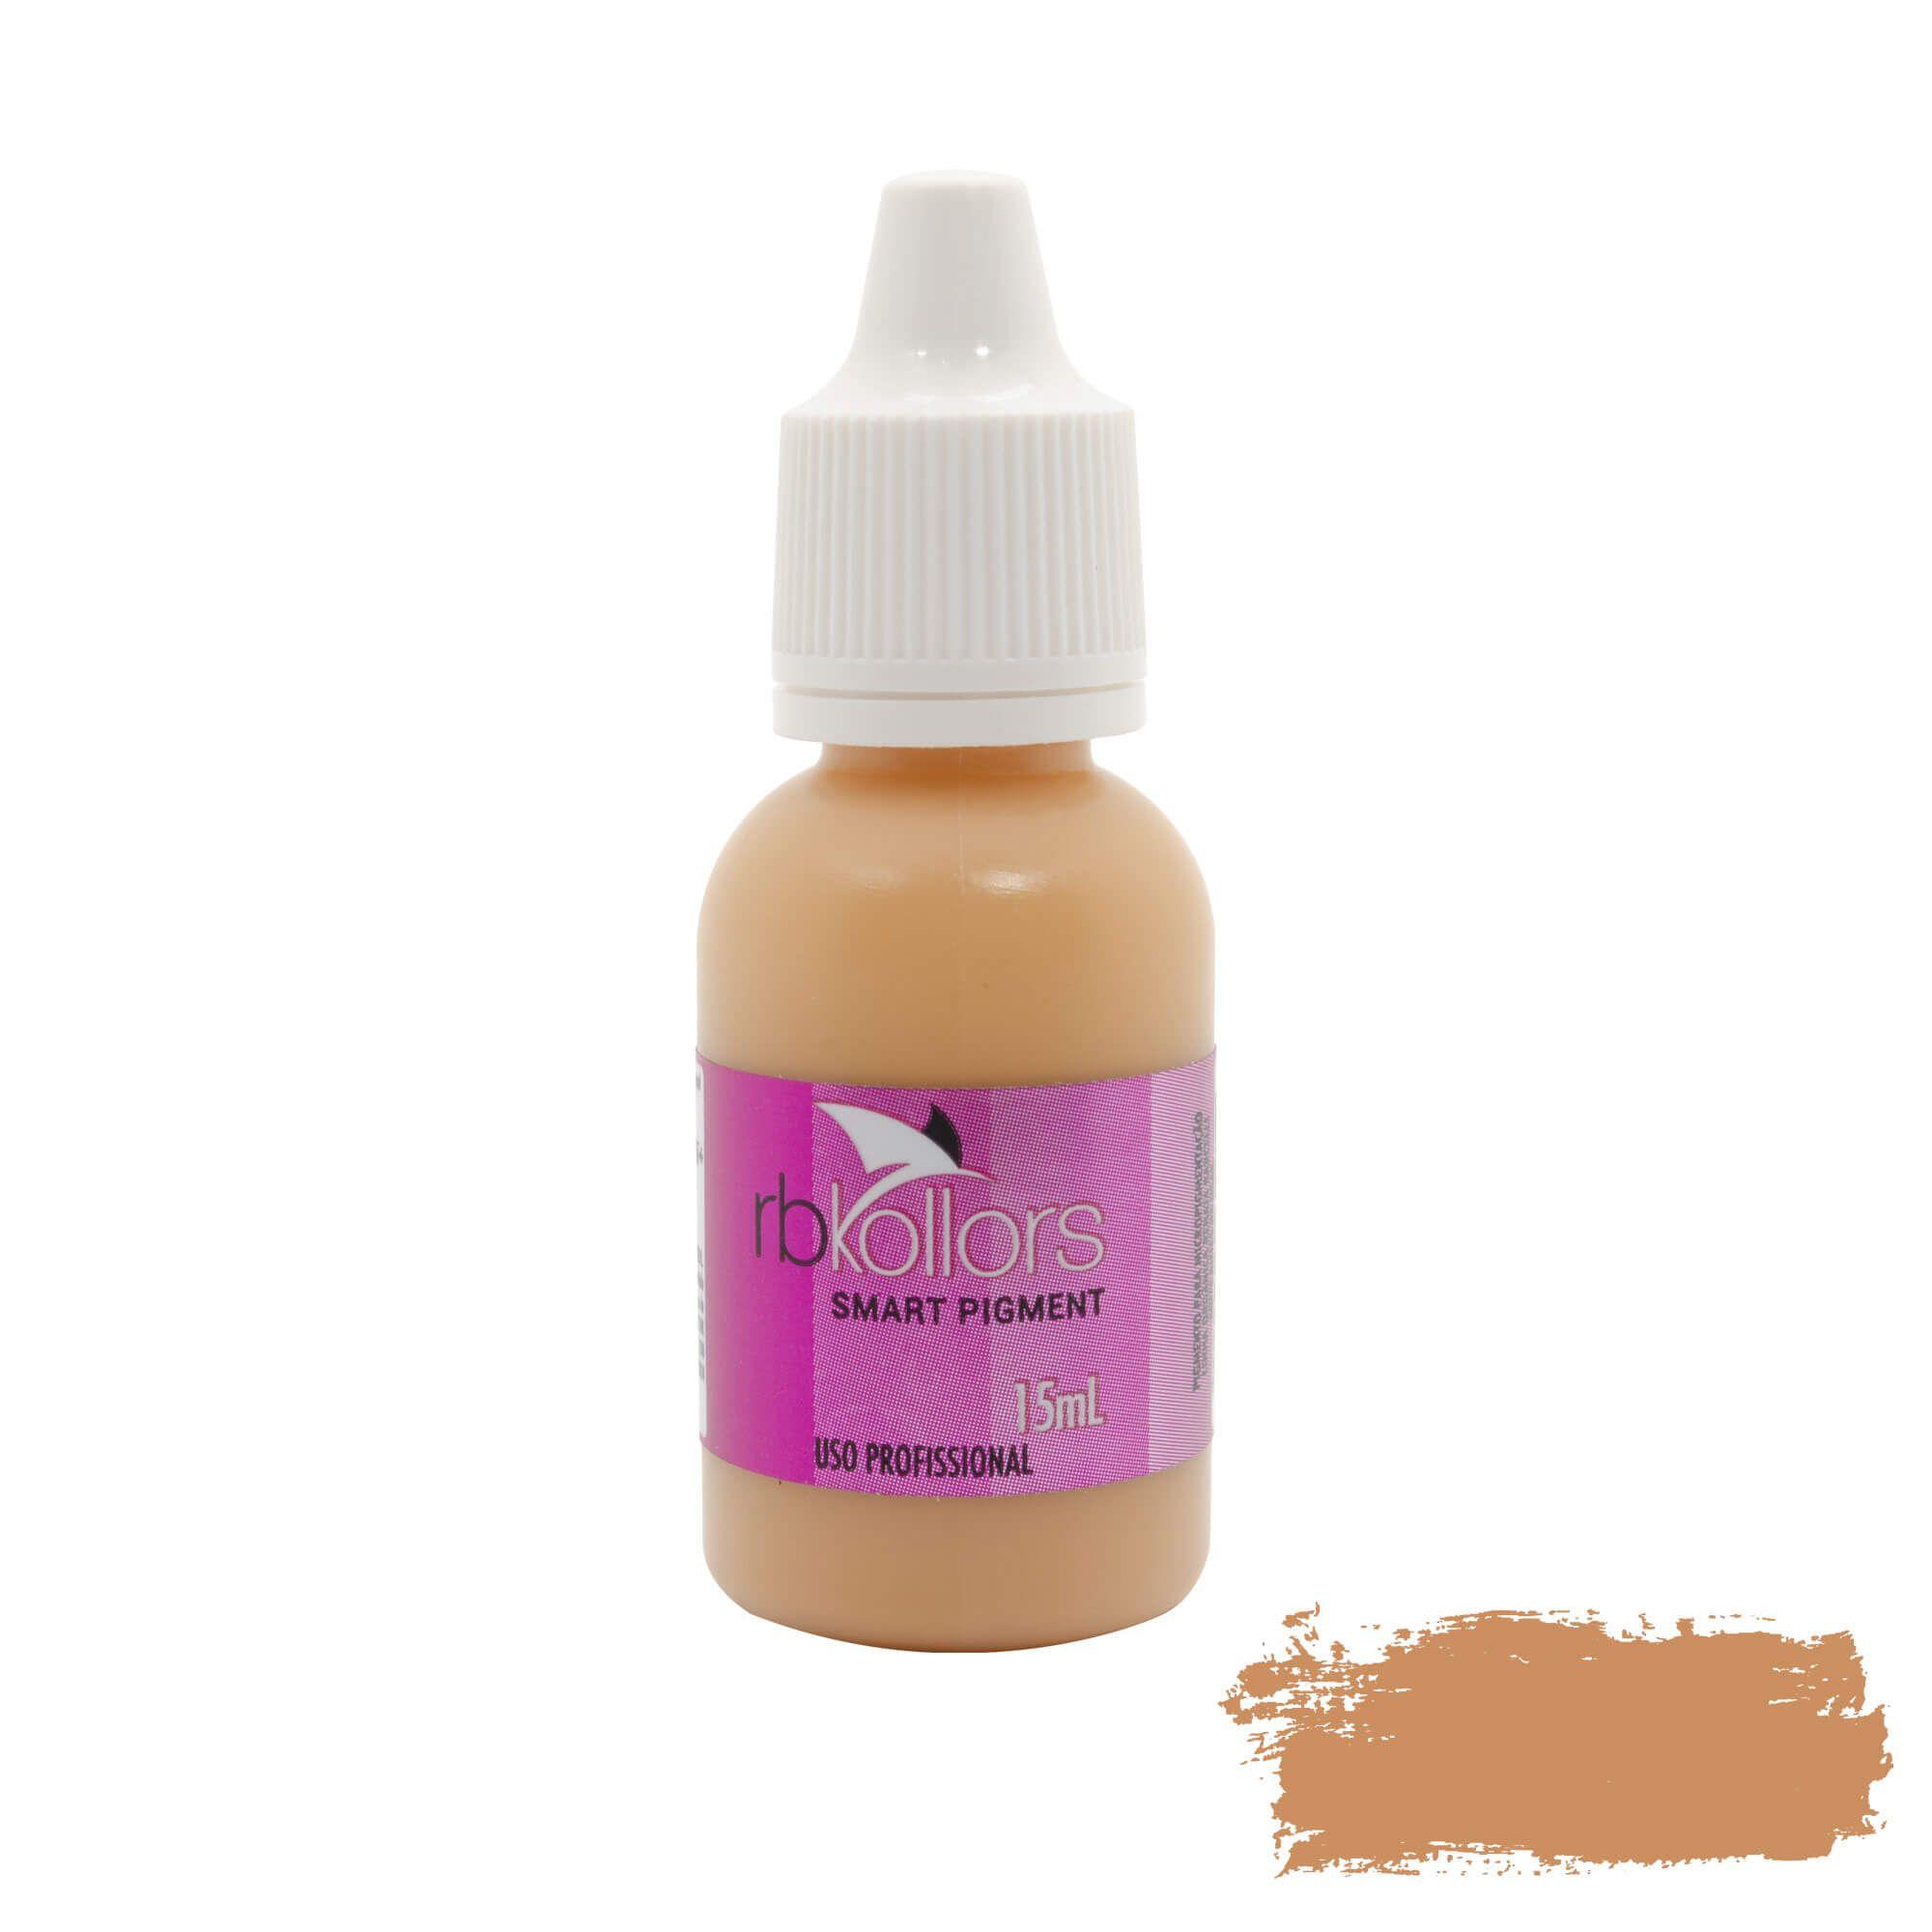 Pigmento Rb Kollors 15ml Honey